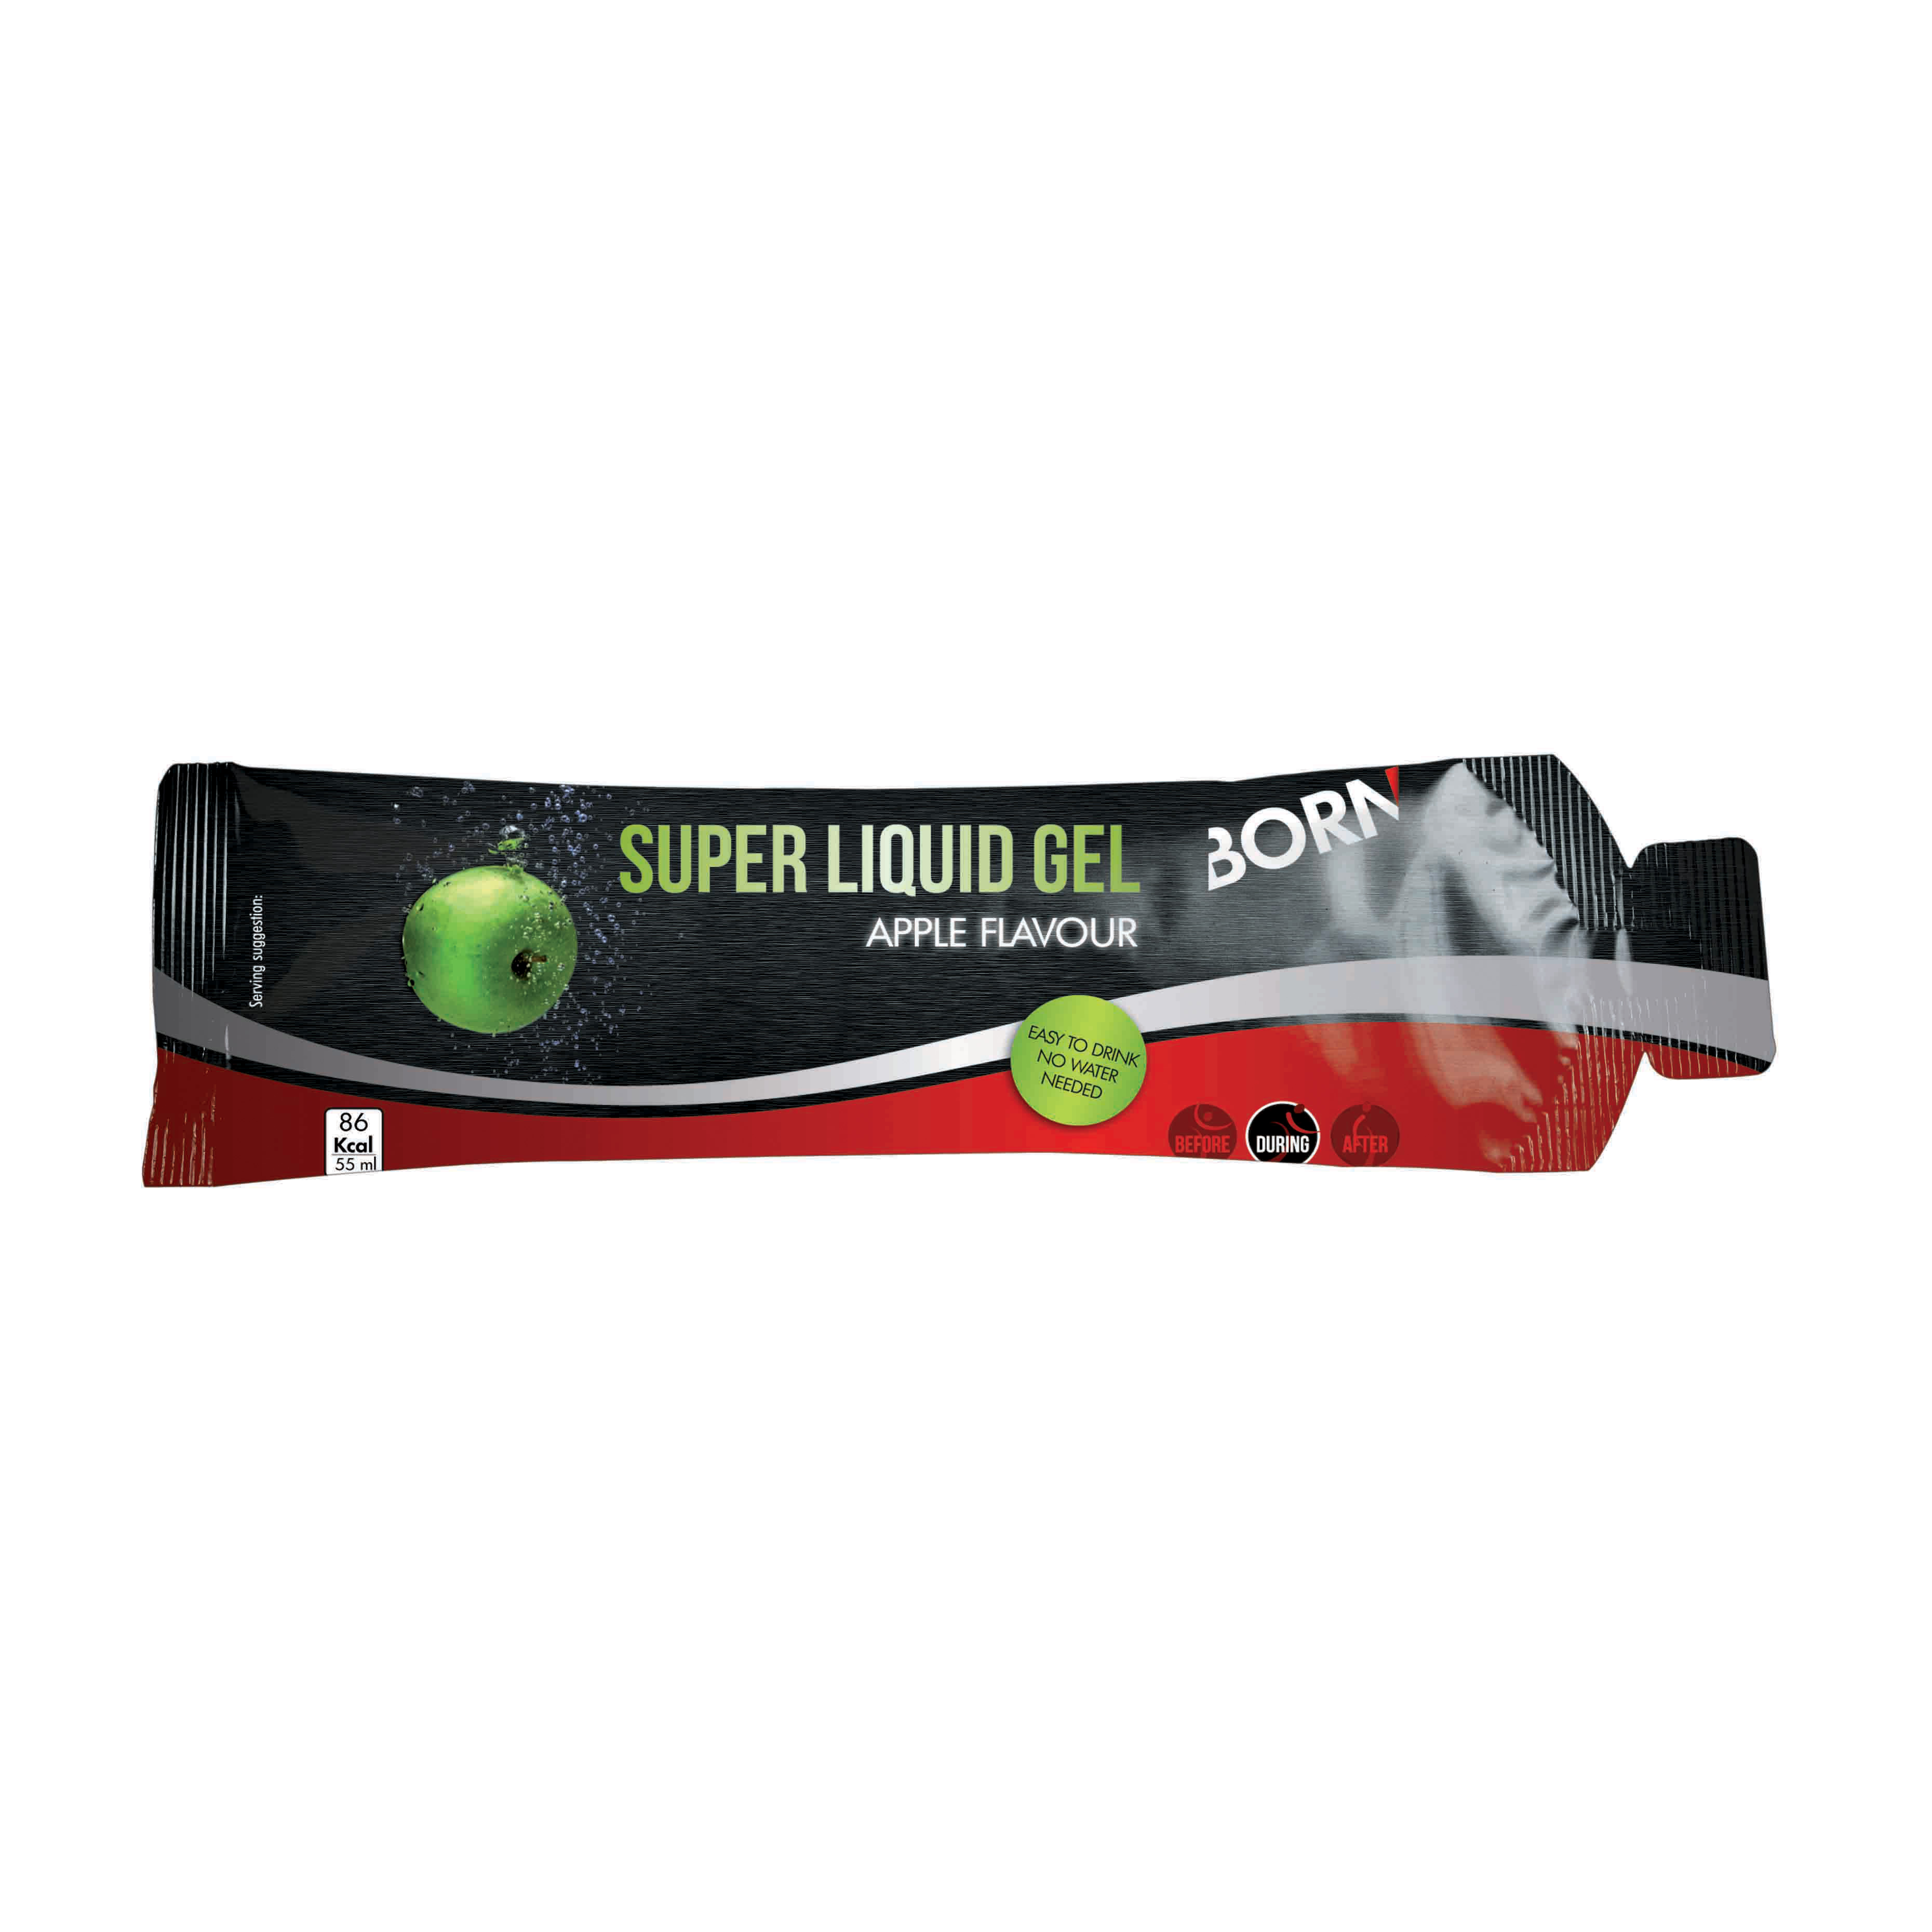 Born SUPER LIQUID GEL easy to drink/no water needed